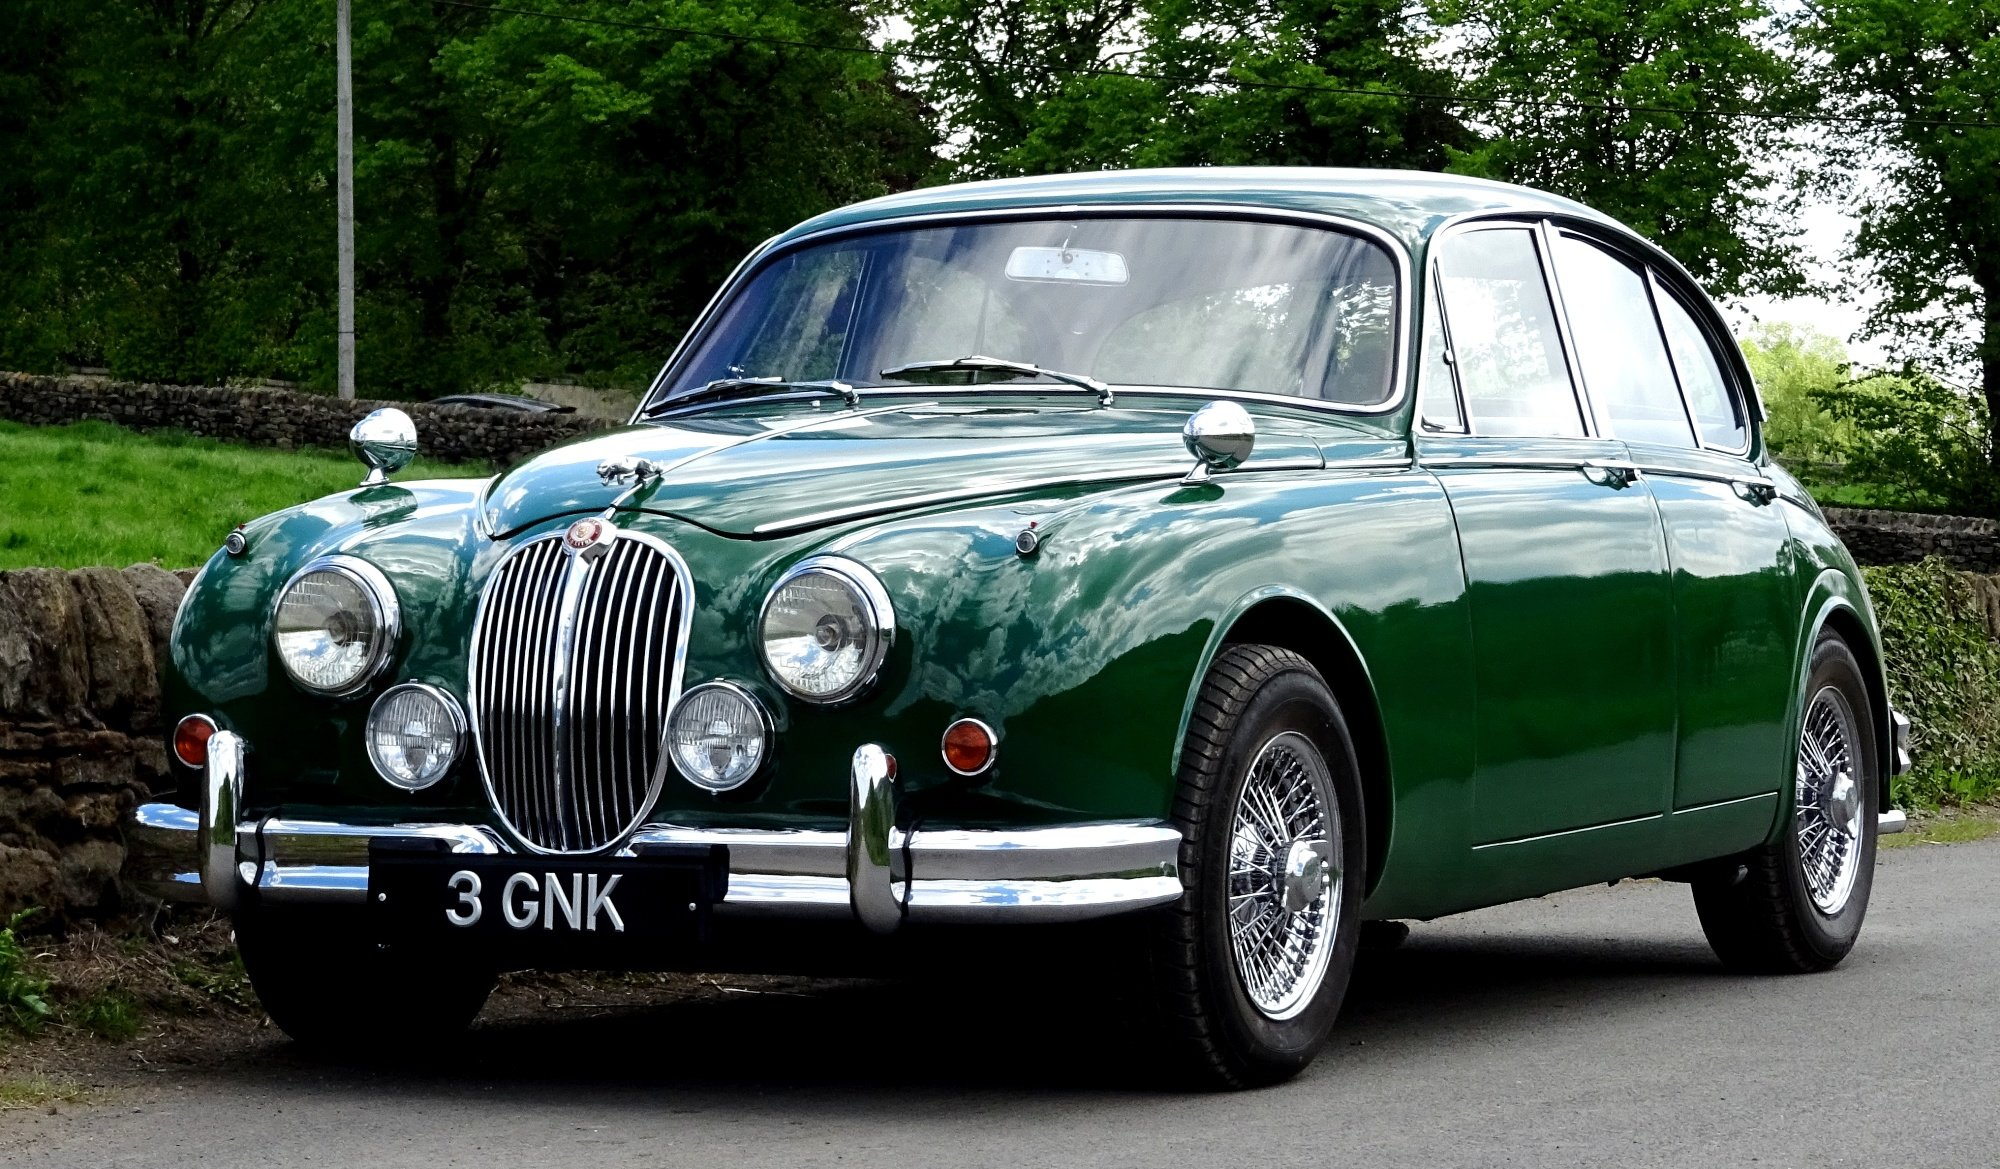 1961 JAGUAR MK2 3.8 LITRE BEAUTIFUL BRITISH CLASSIC CAR For Sale (picture 3 of 6)